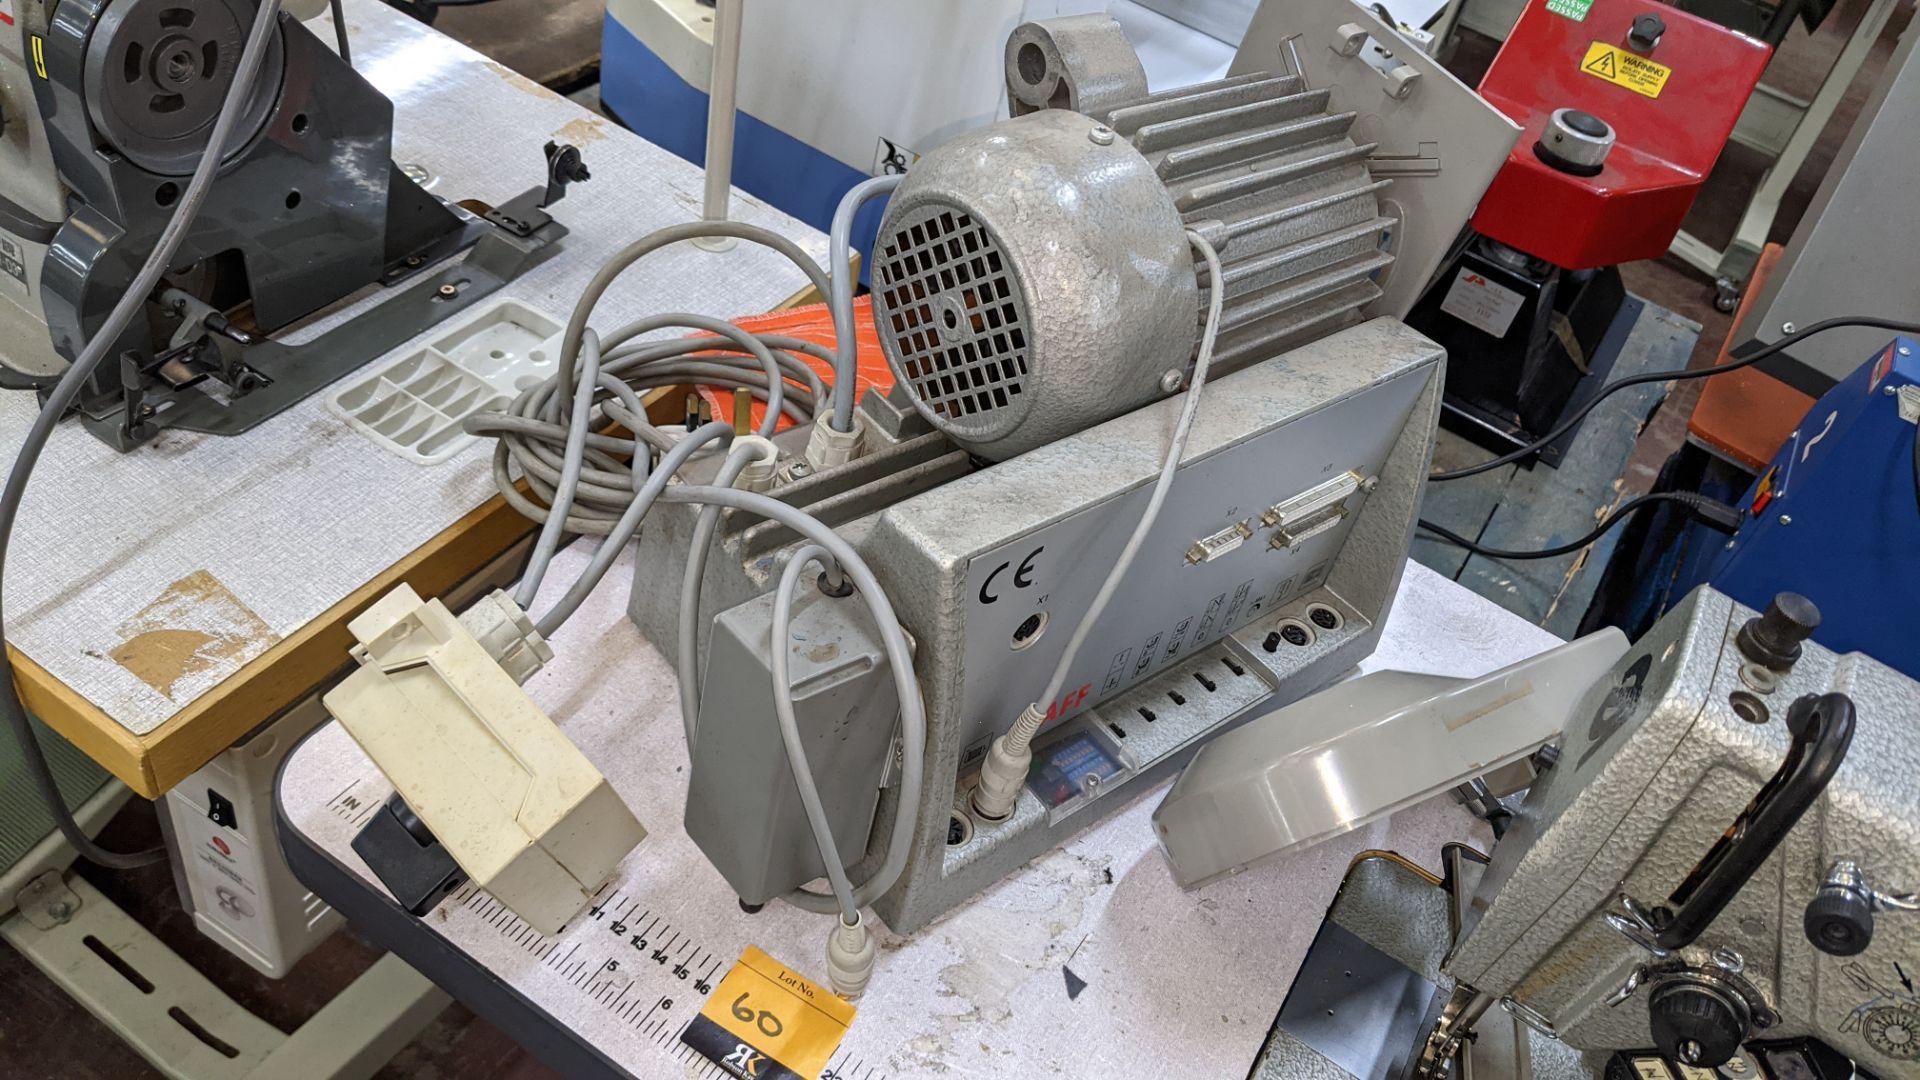 Durkopp Adler type 0271-L40042 sewing machine - Image 13 of 19